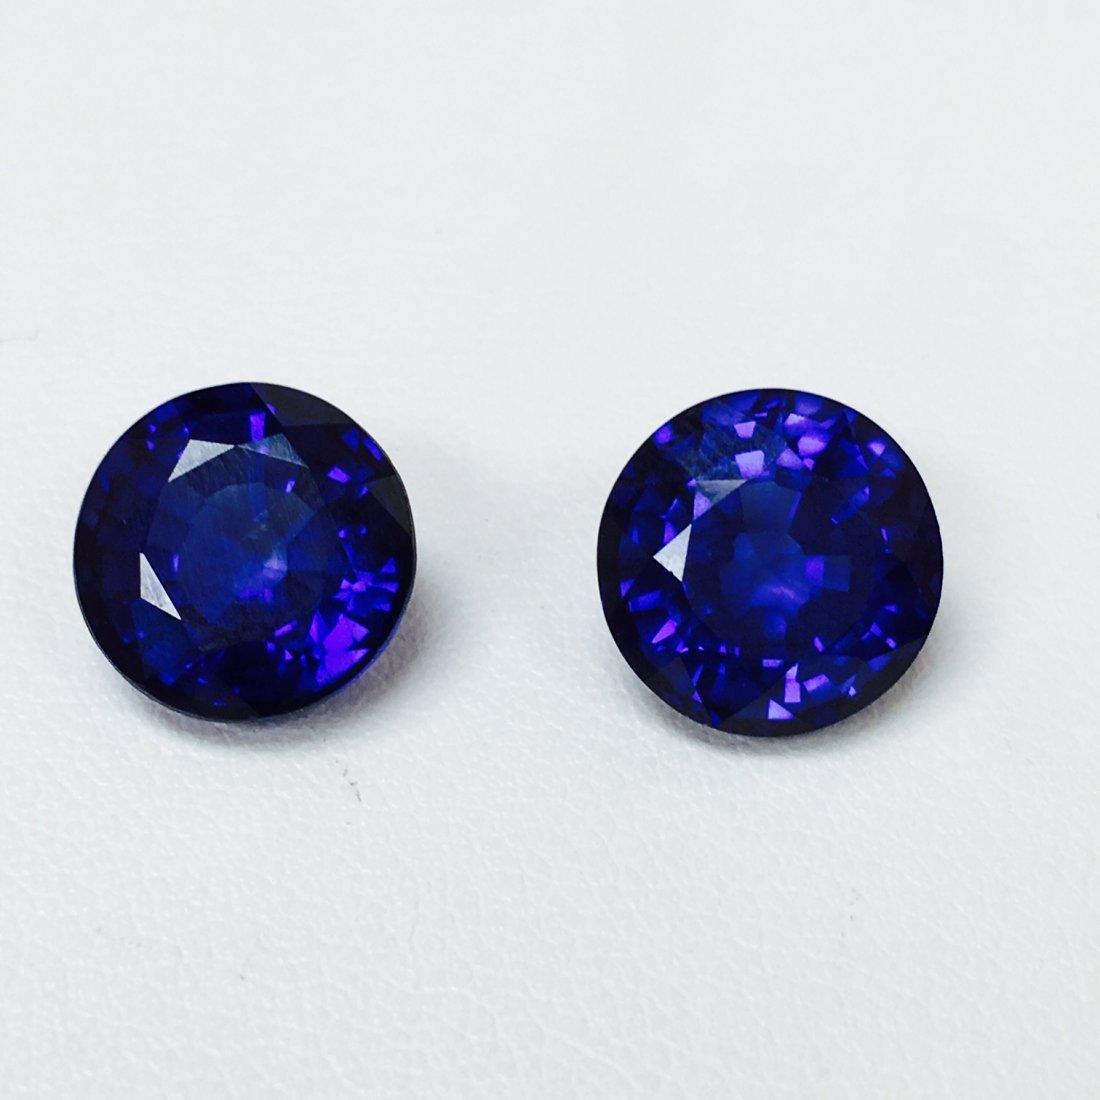 10.70 Carat, Natural Blue Sapphire lot